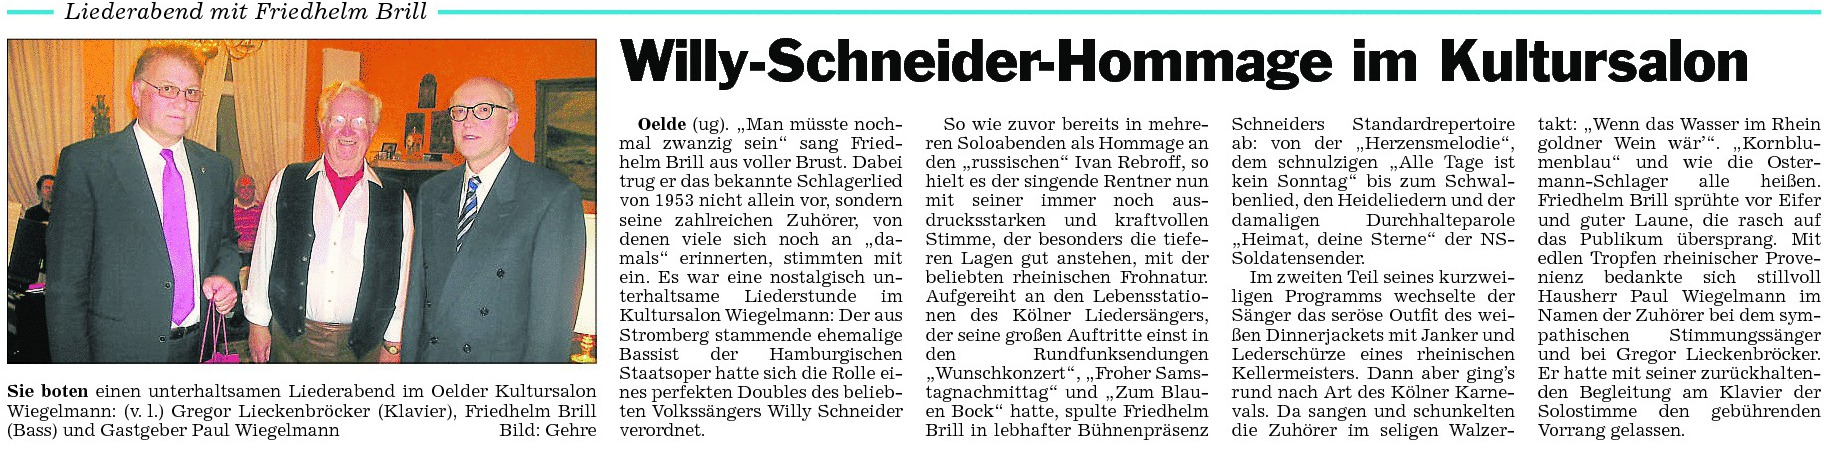 38 Pressebericht 28.09.2012 Fr.Brill